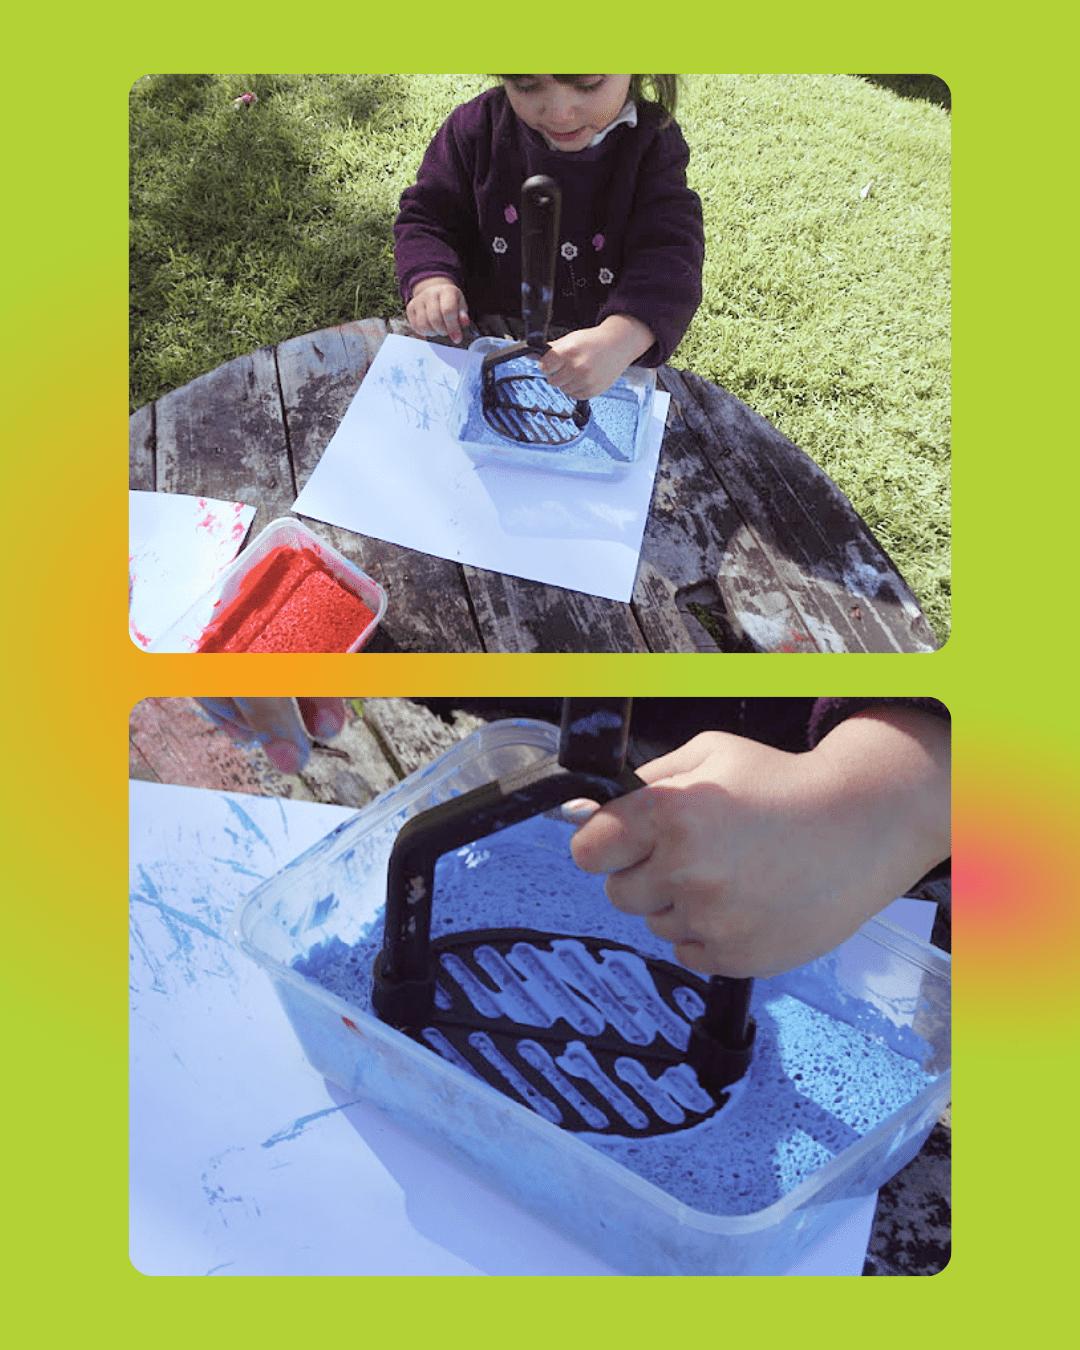 Stamper and Swatter activities using sensory tools  - sensory activities